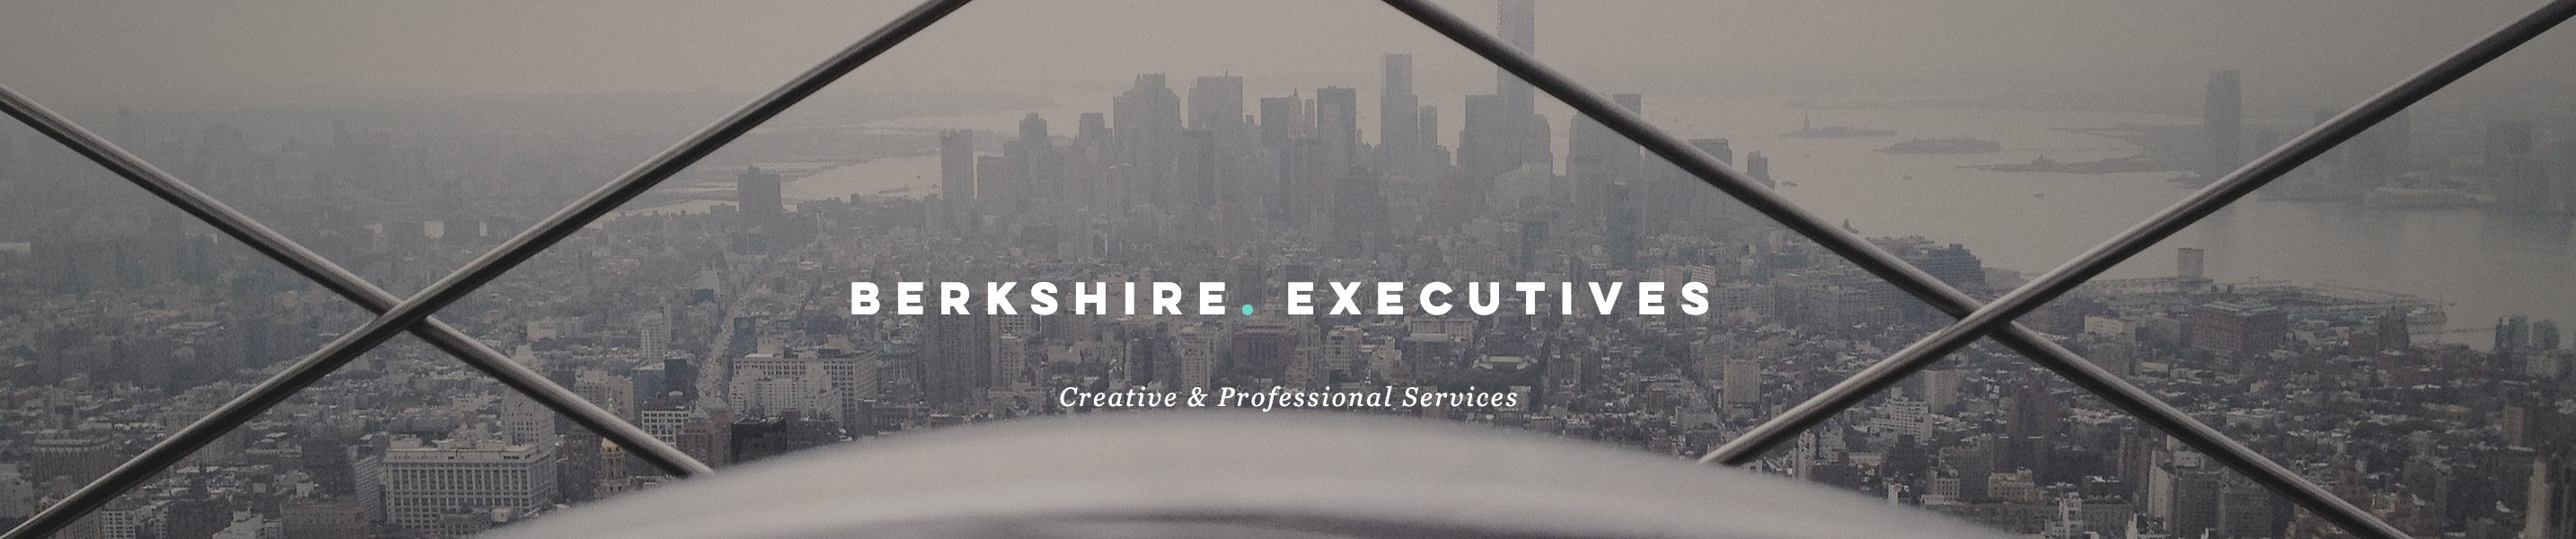 Berkshire Executives | LinkedIn